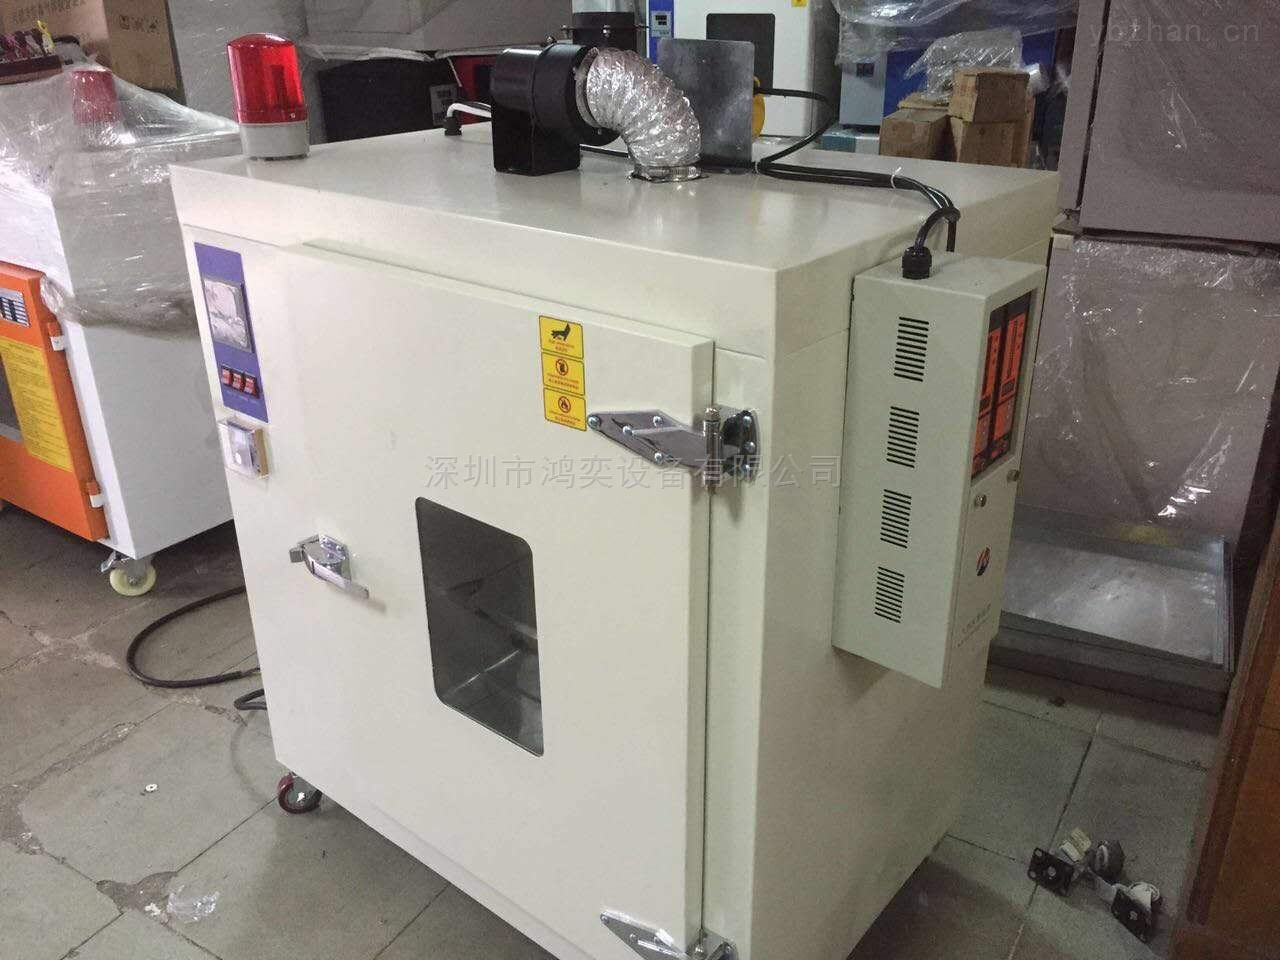 HYYHK-1230-電熱不銹鋼烘烤箱雙門工業大型高溫烤箱